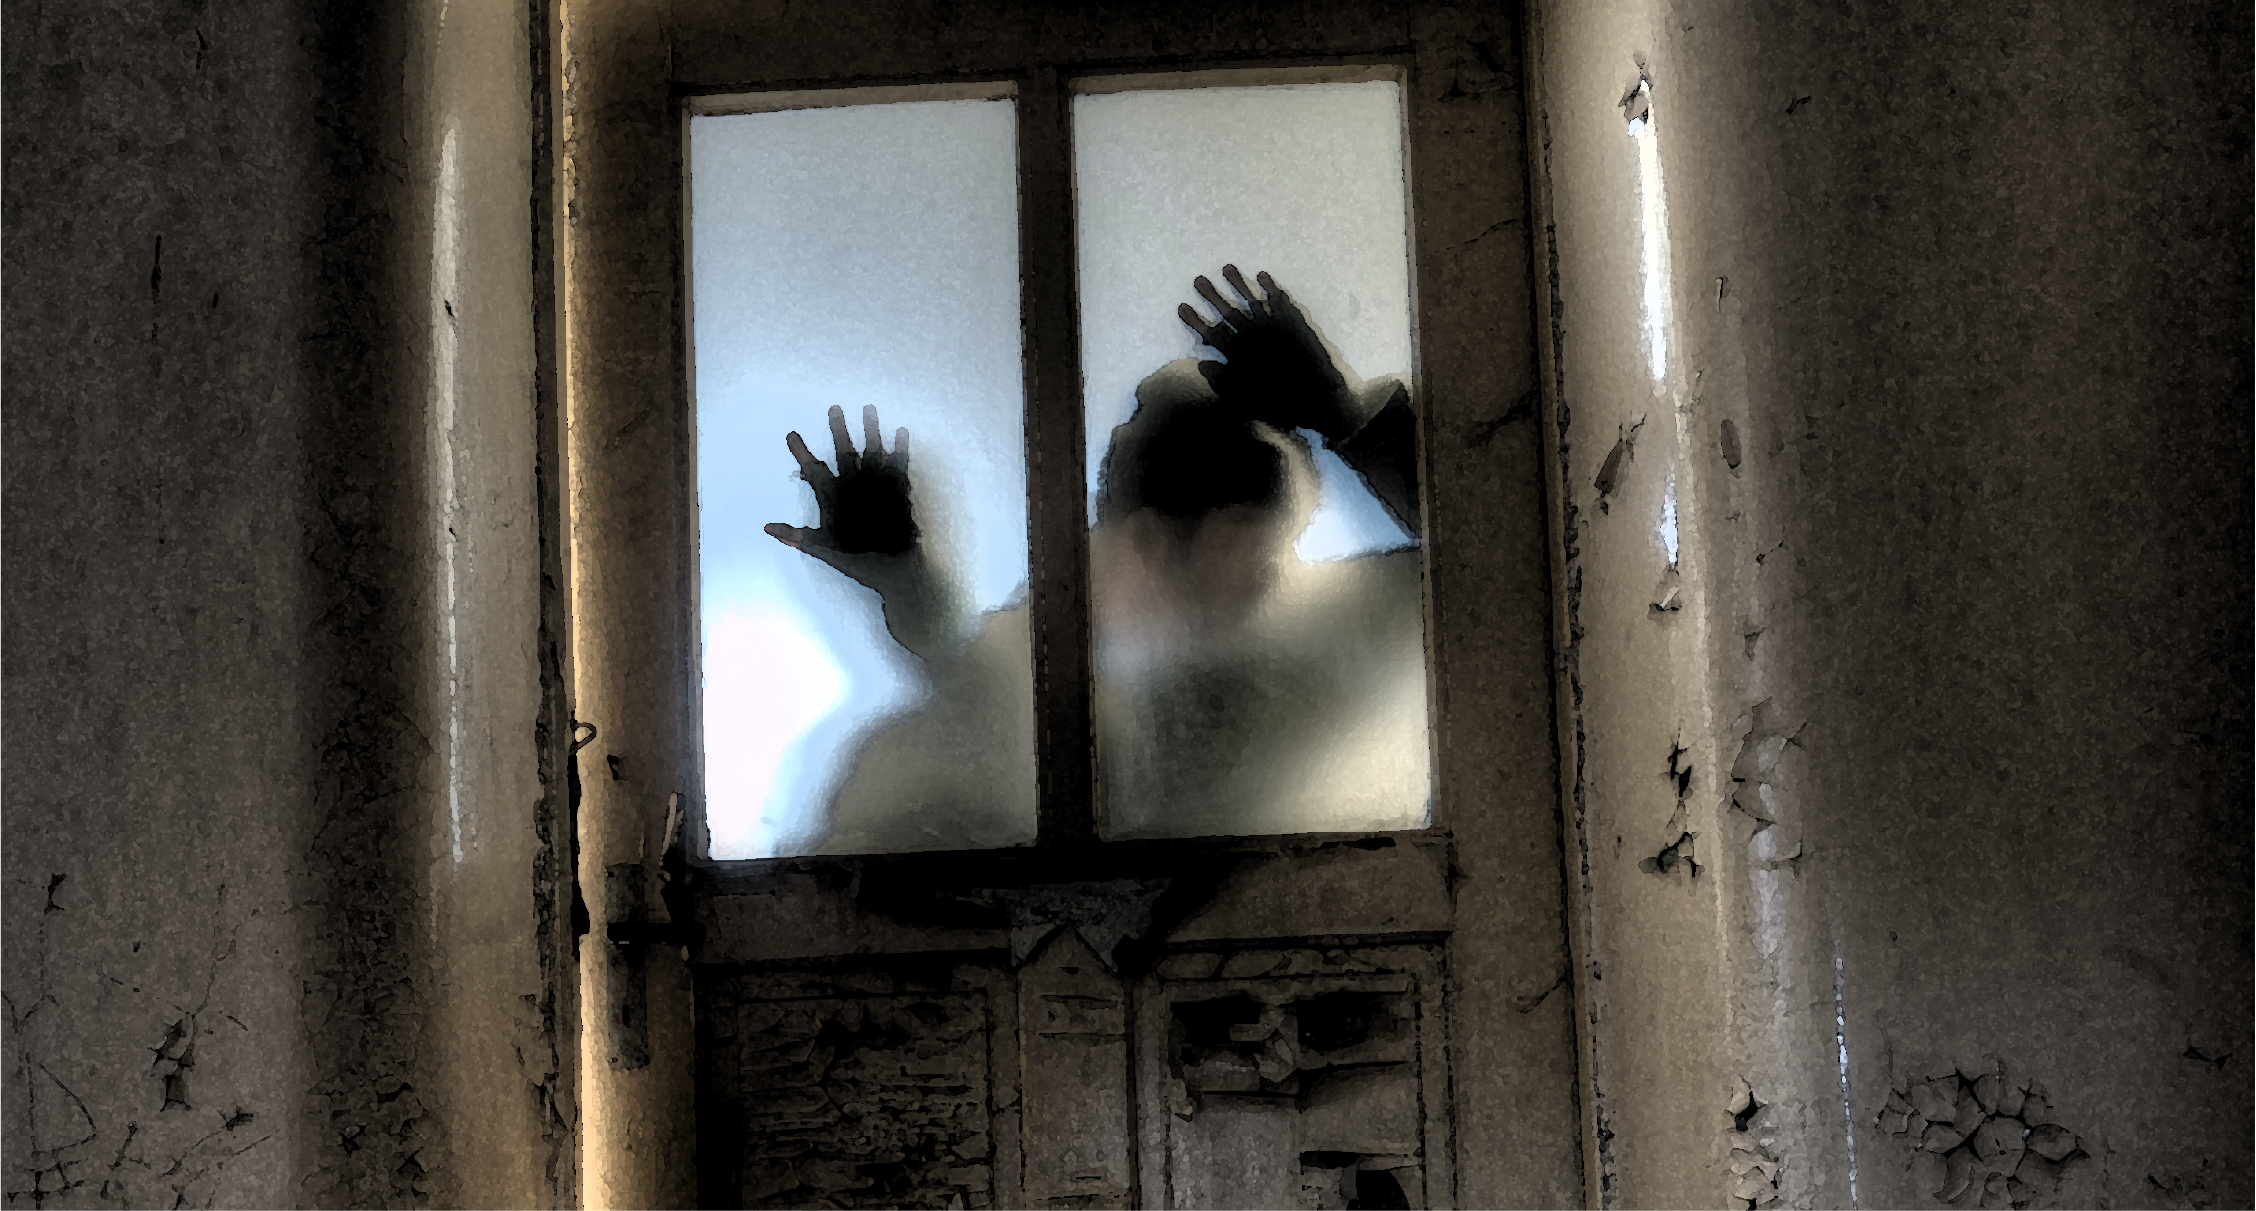 Storymancer Edicola Storie Imperfette Racconto Zombie